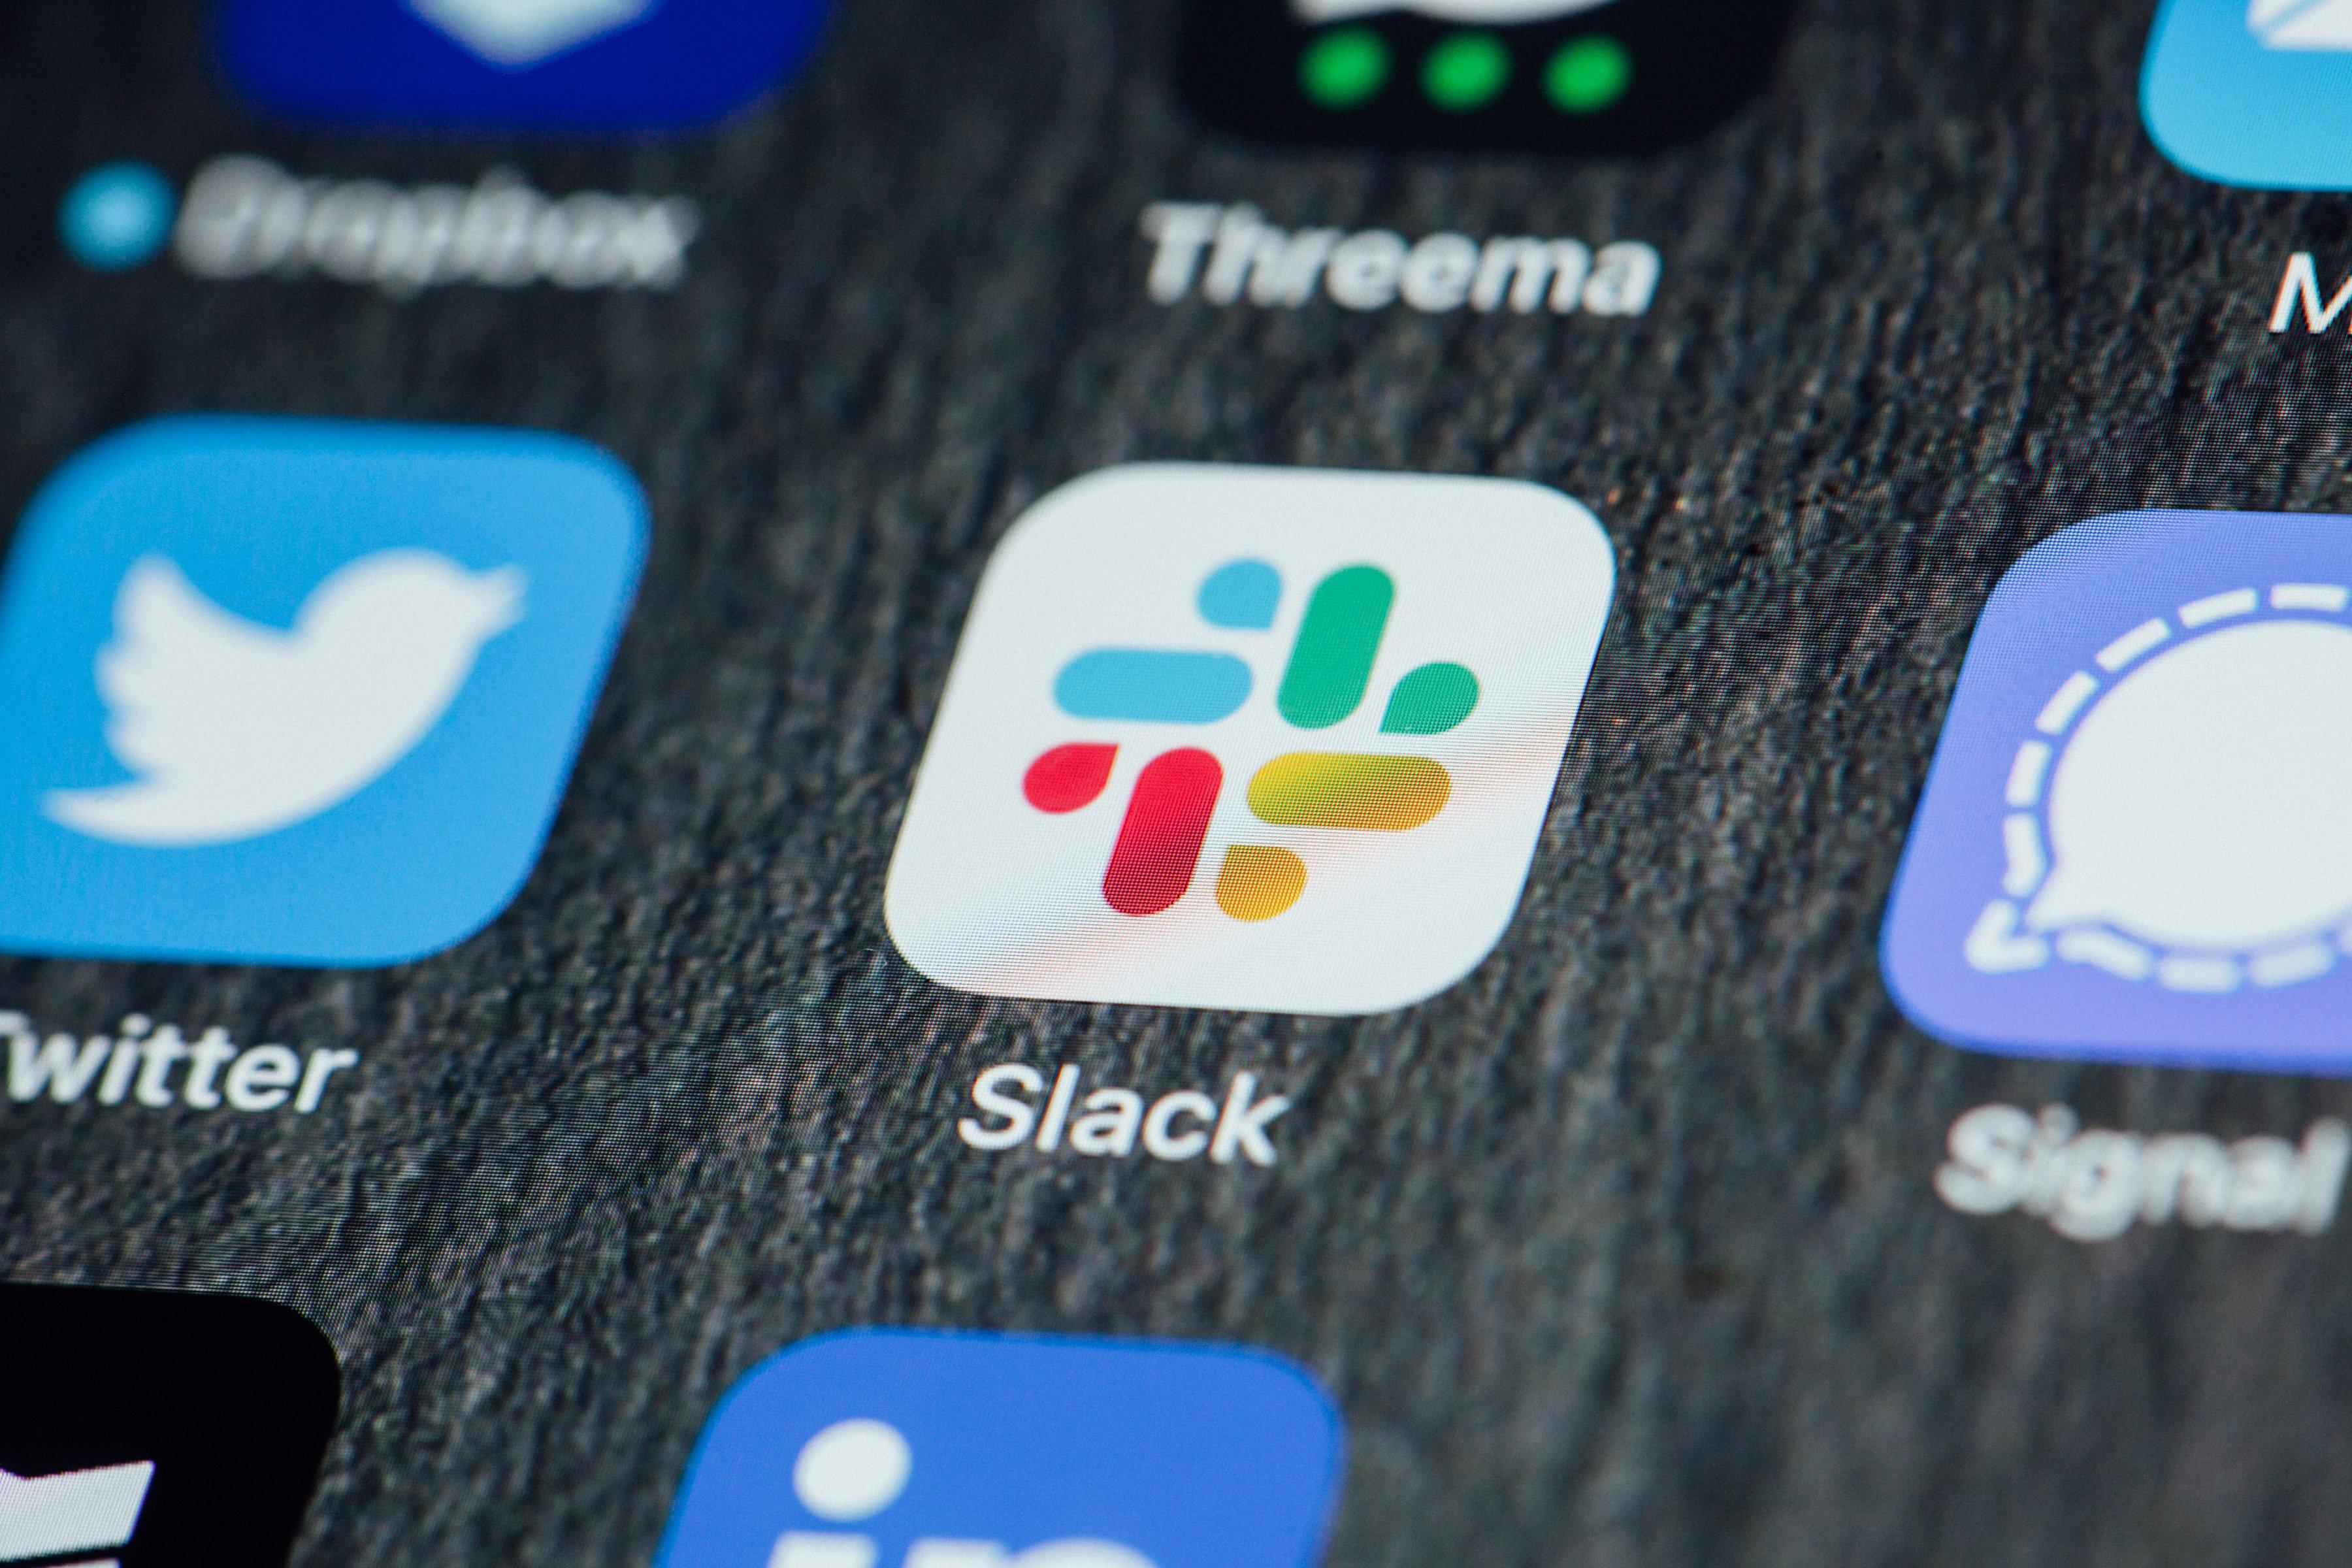 SEC Wants Ripple Employee's Slack Messages